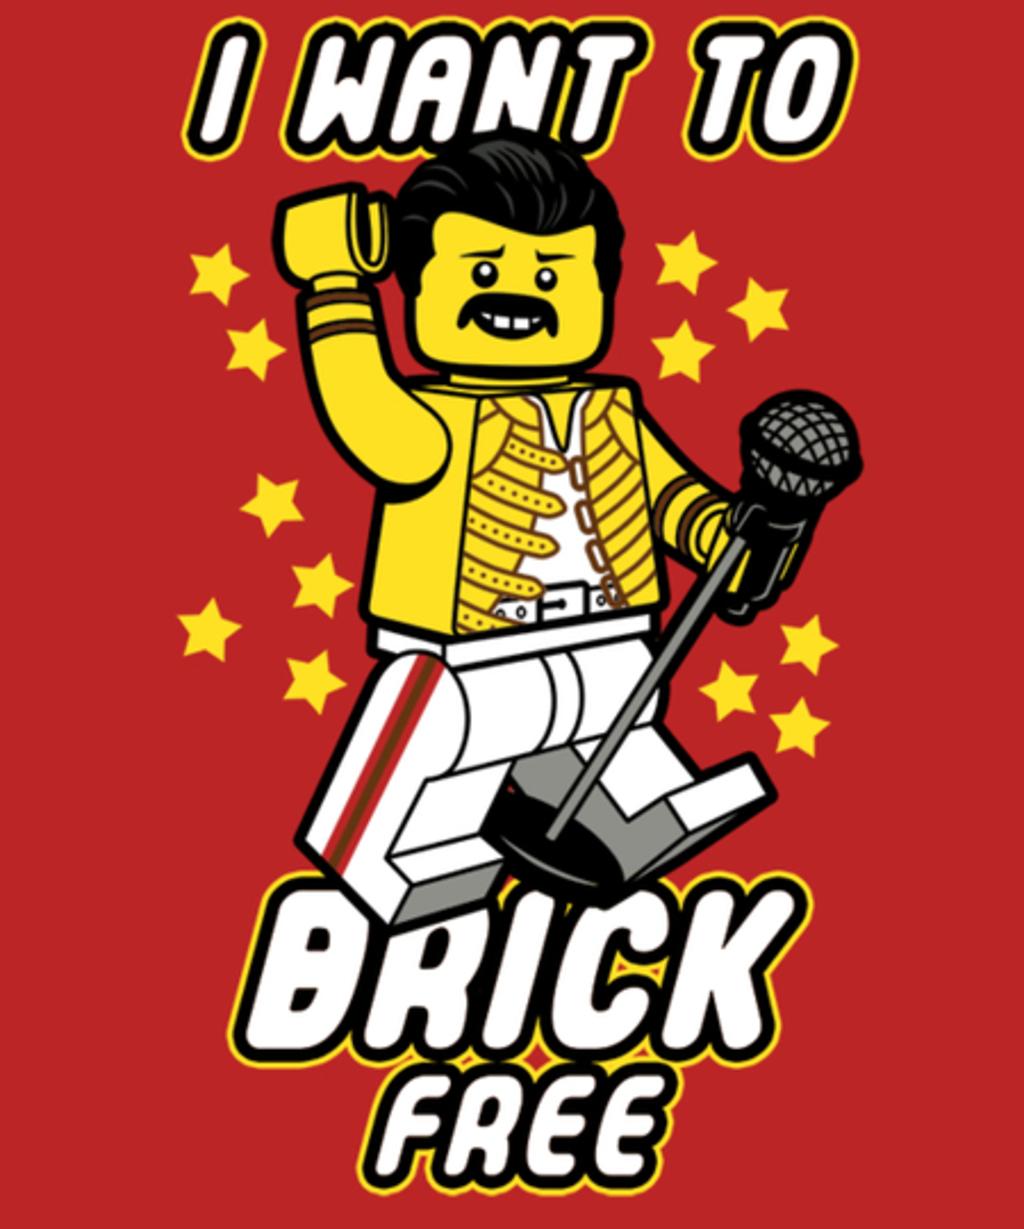 Qwertee: I Want to Brick Free